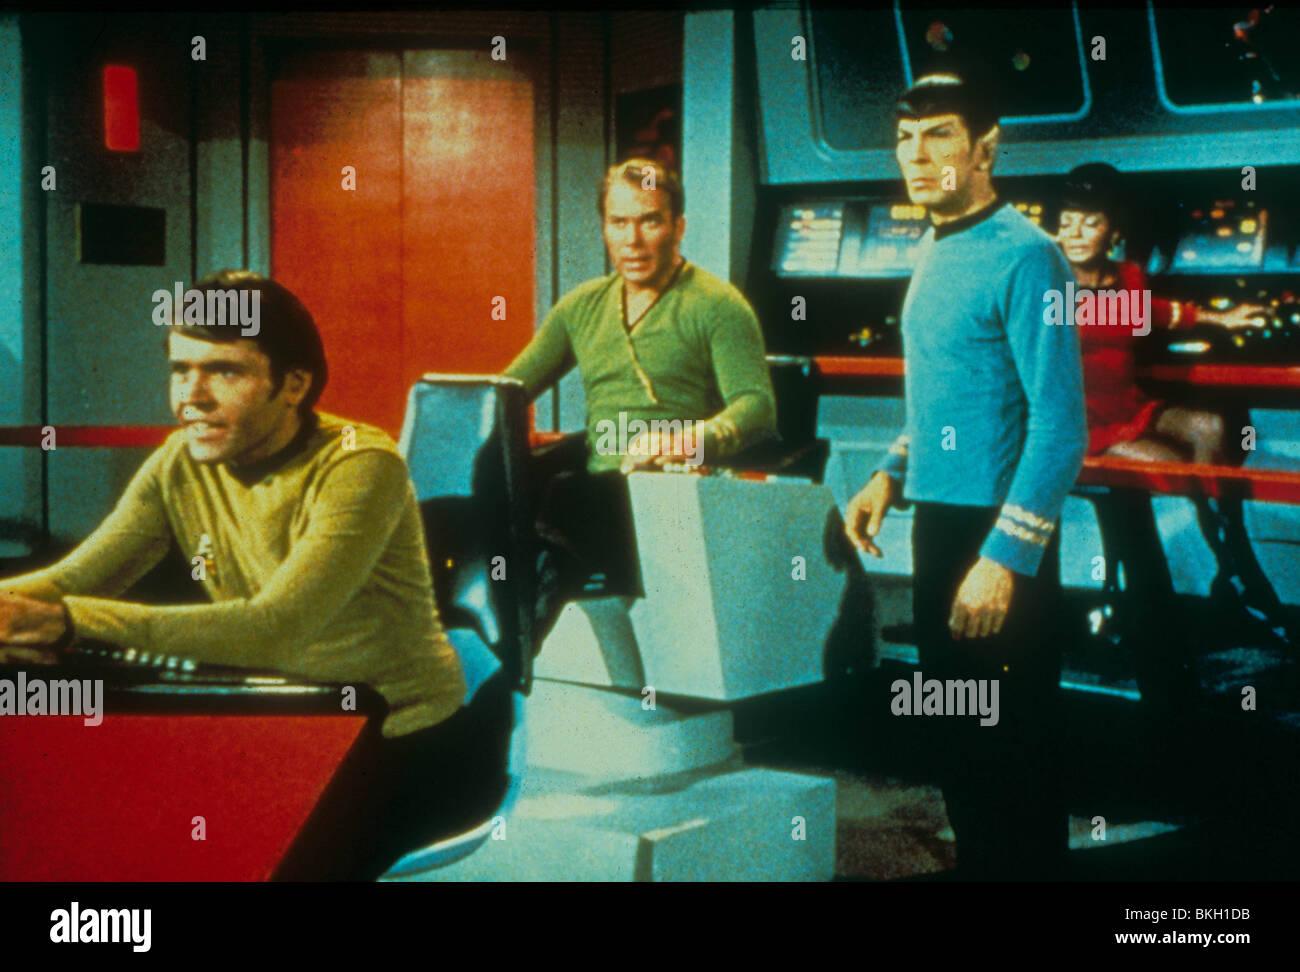 STAR TREK (TV) WALTER KOENIG, WILLIAM SHATNER, LEONARD NIMOY, NICHELLE NICHOLS STK 058 - Stock Image